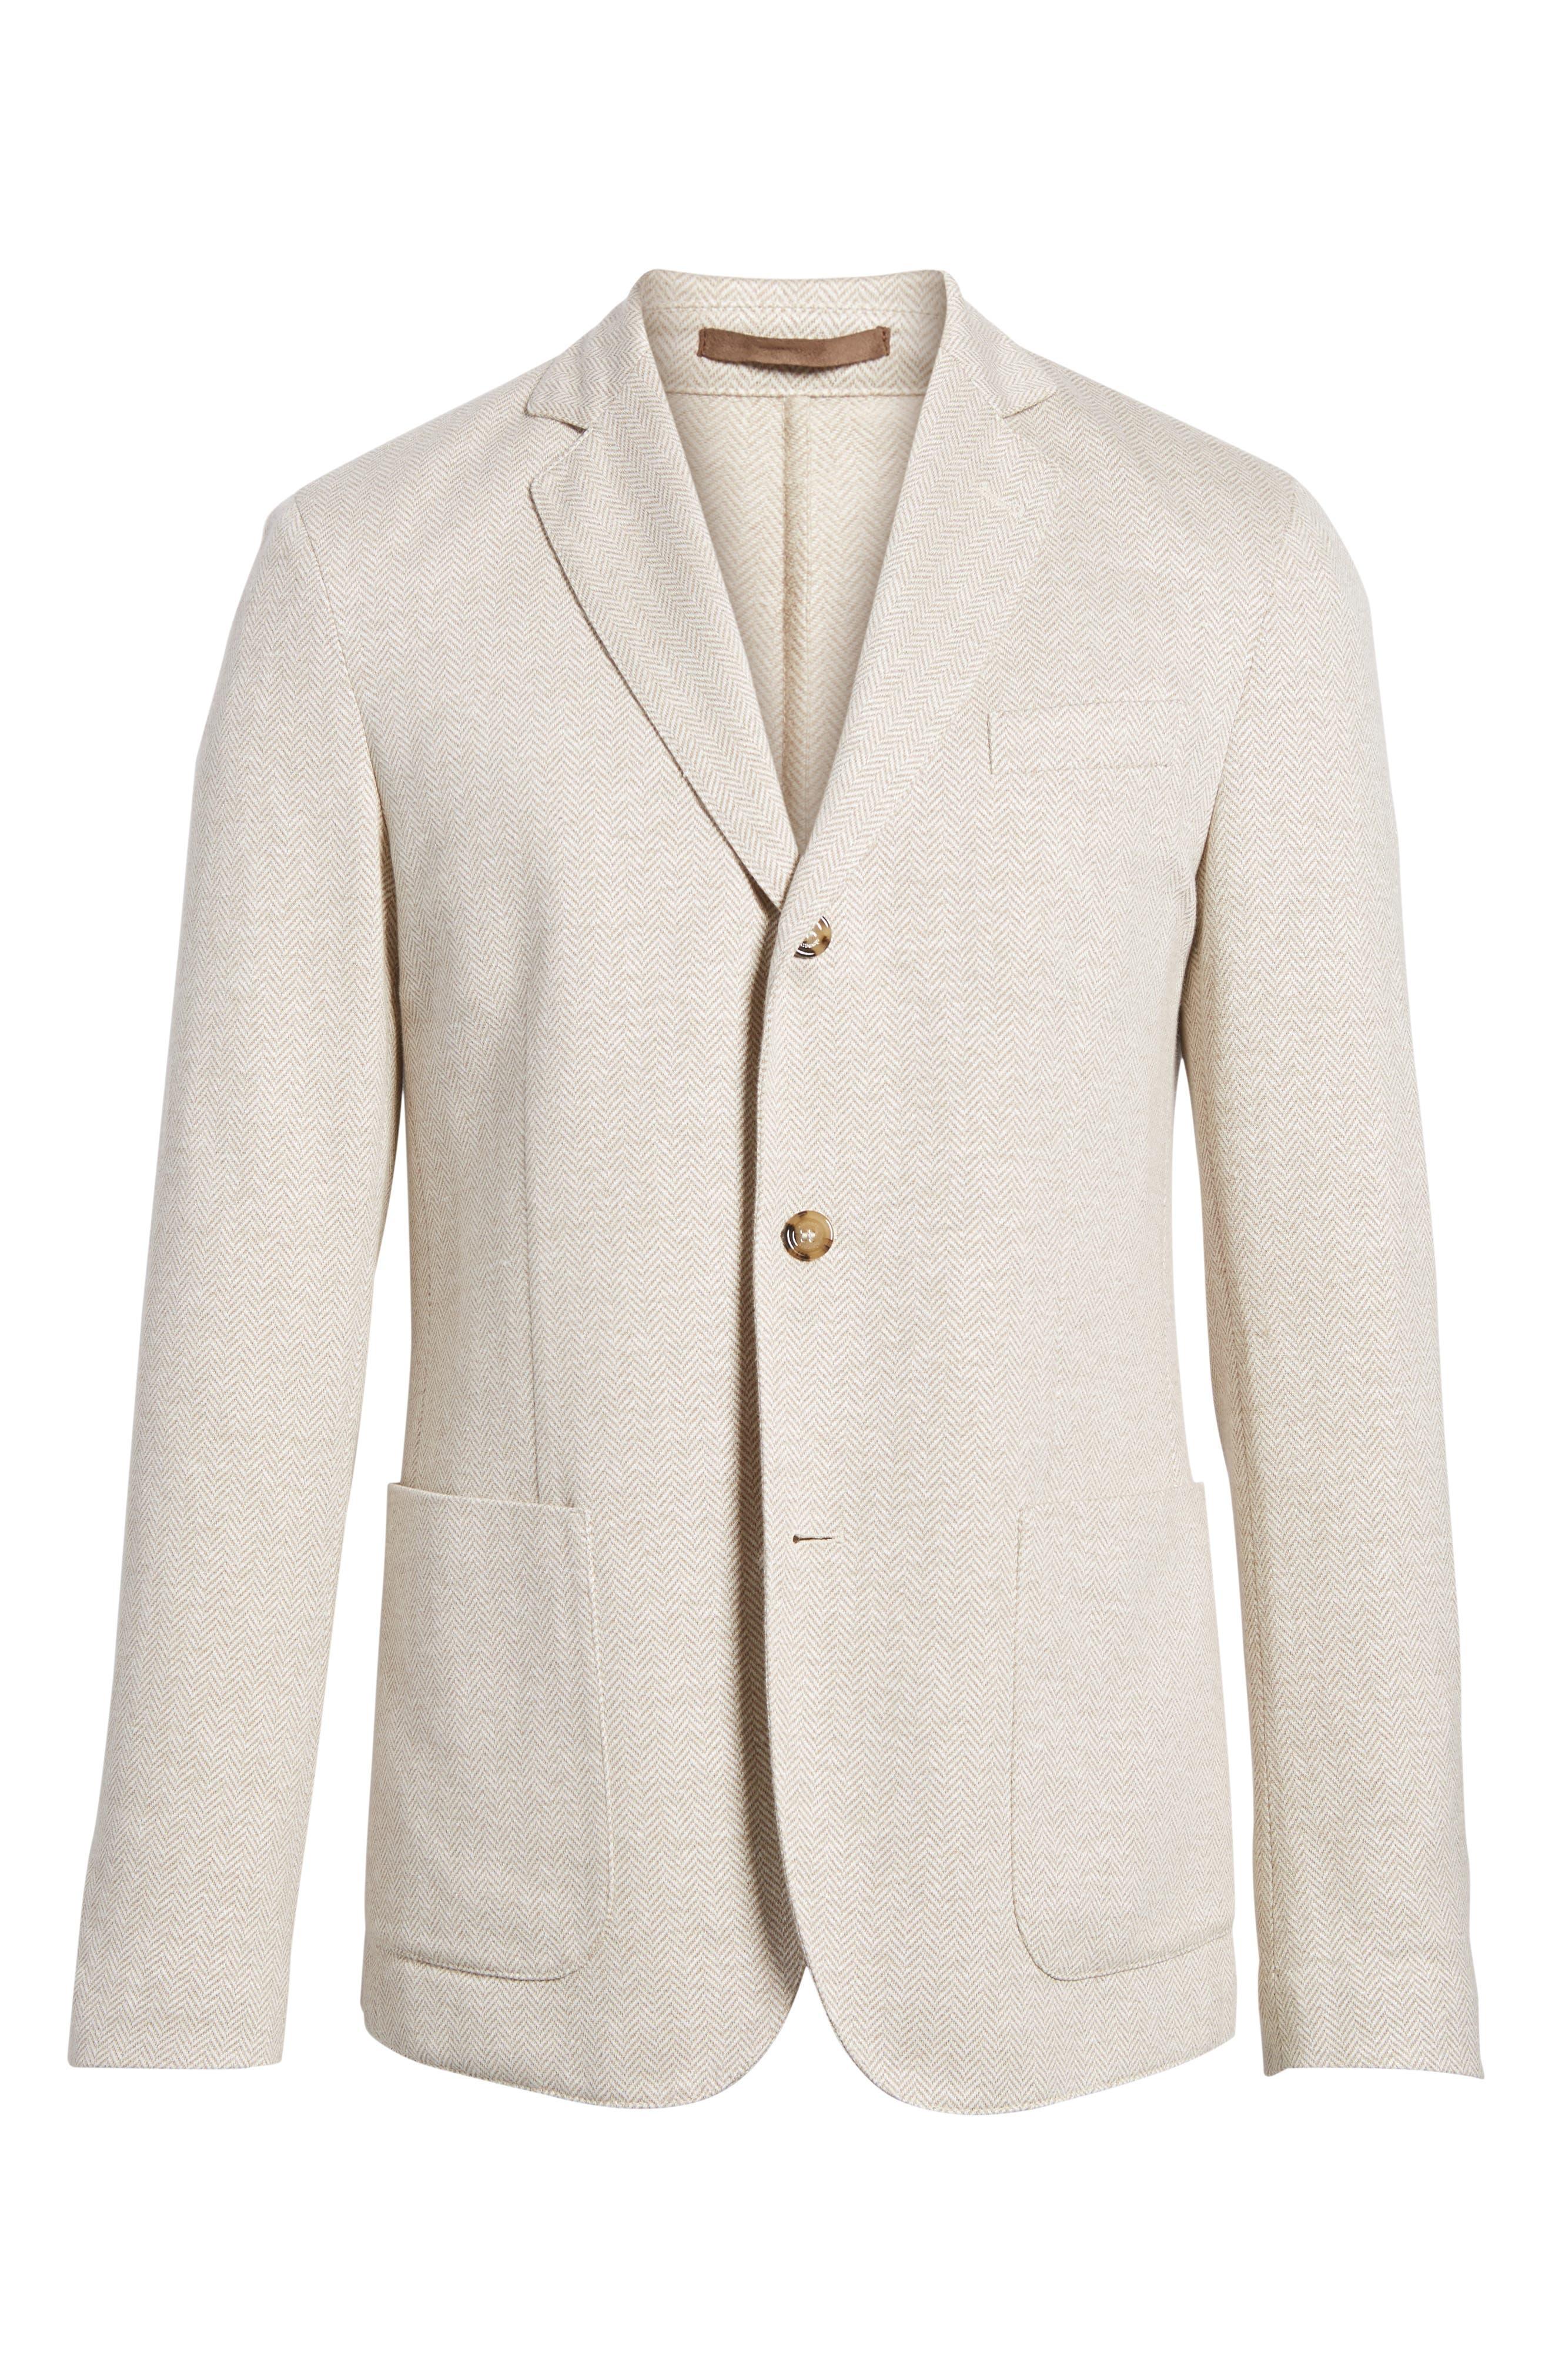 Trim Fit Herringbone Linen & Cotton Jacket,                             Alternate thumbnail 5, color,                             231